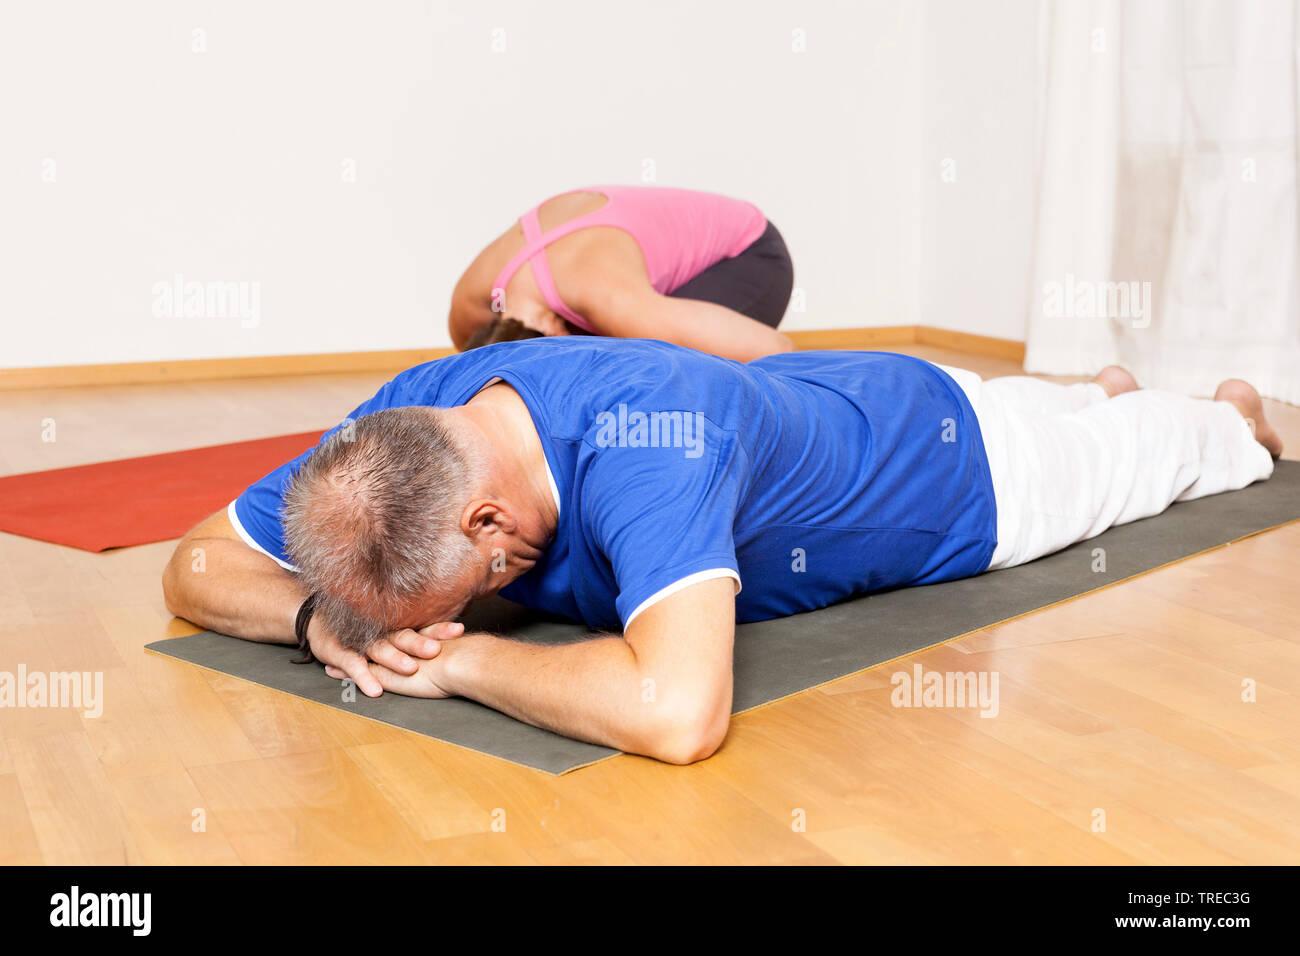 woman and man doing yoga, Europe Stock Photo